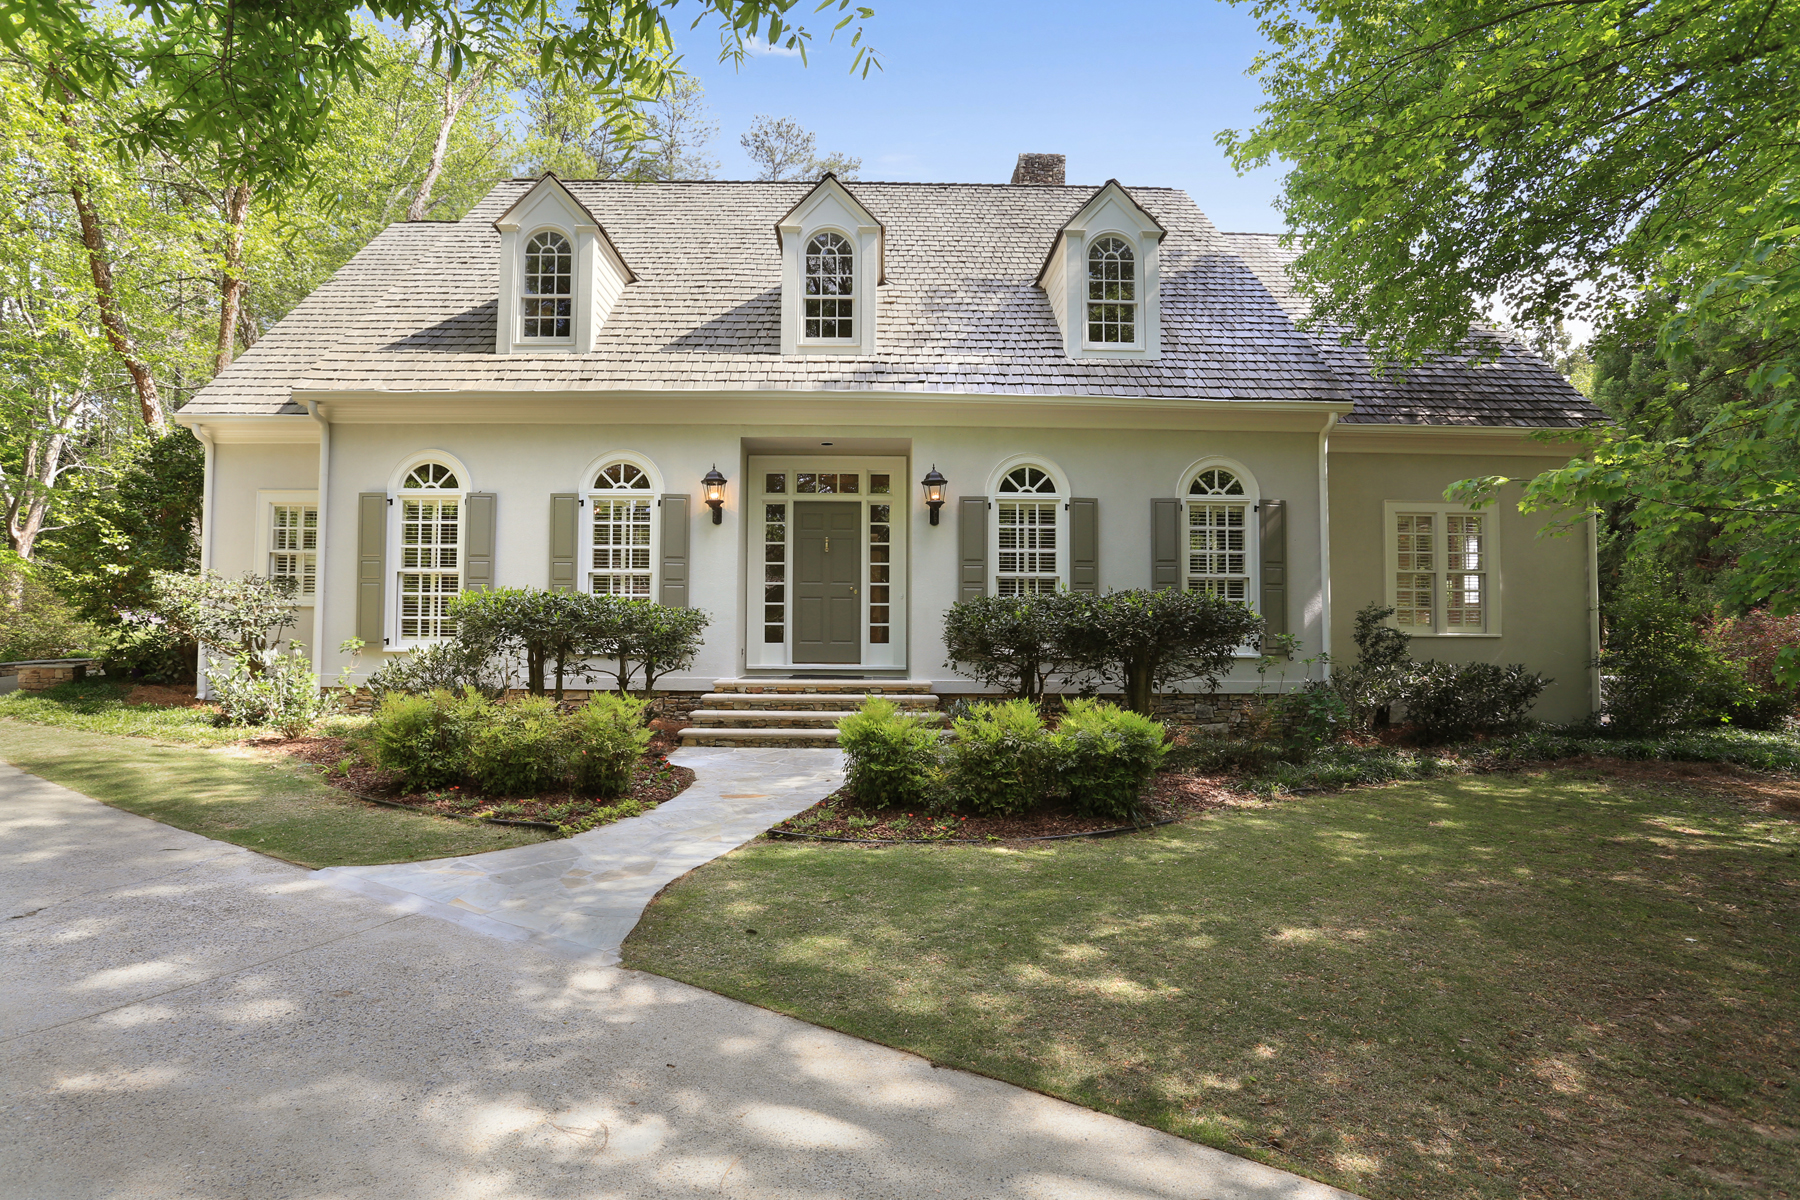 独户住宅 为 销售 在 Classy, Sophisticated Home In Idyllic Location 10 Old Stratton Chase 桑迪, 乔治亚州, 30328 美国